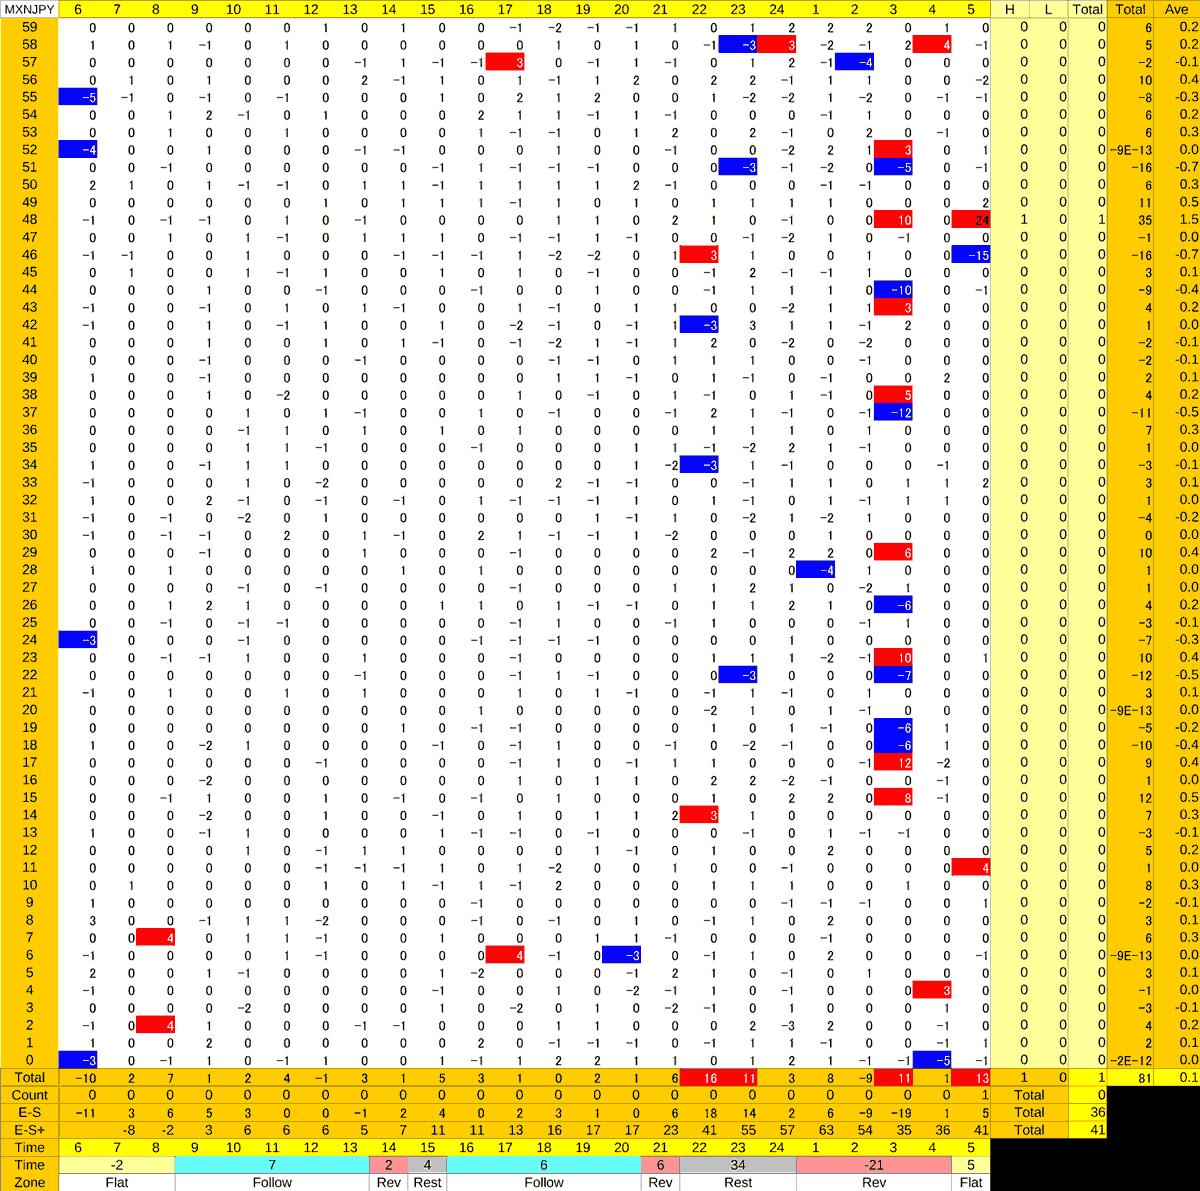 20201224_HS(3)MXNJPY